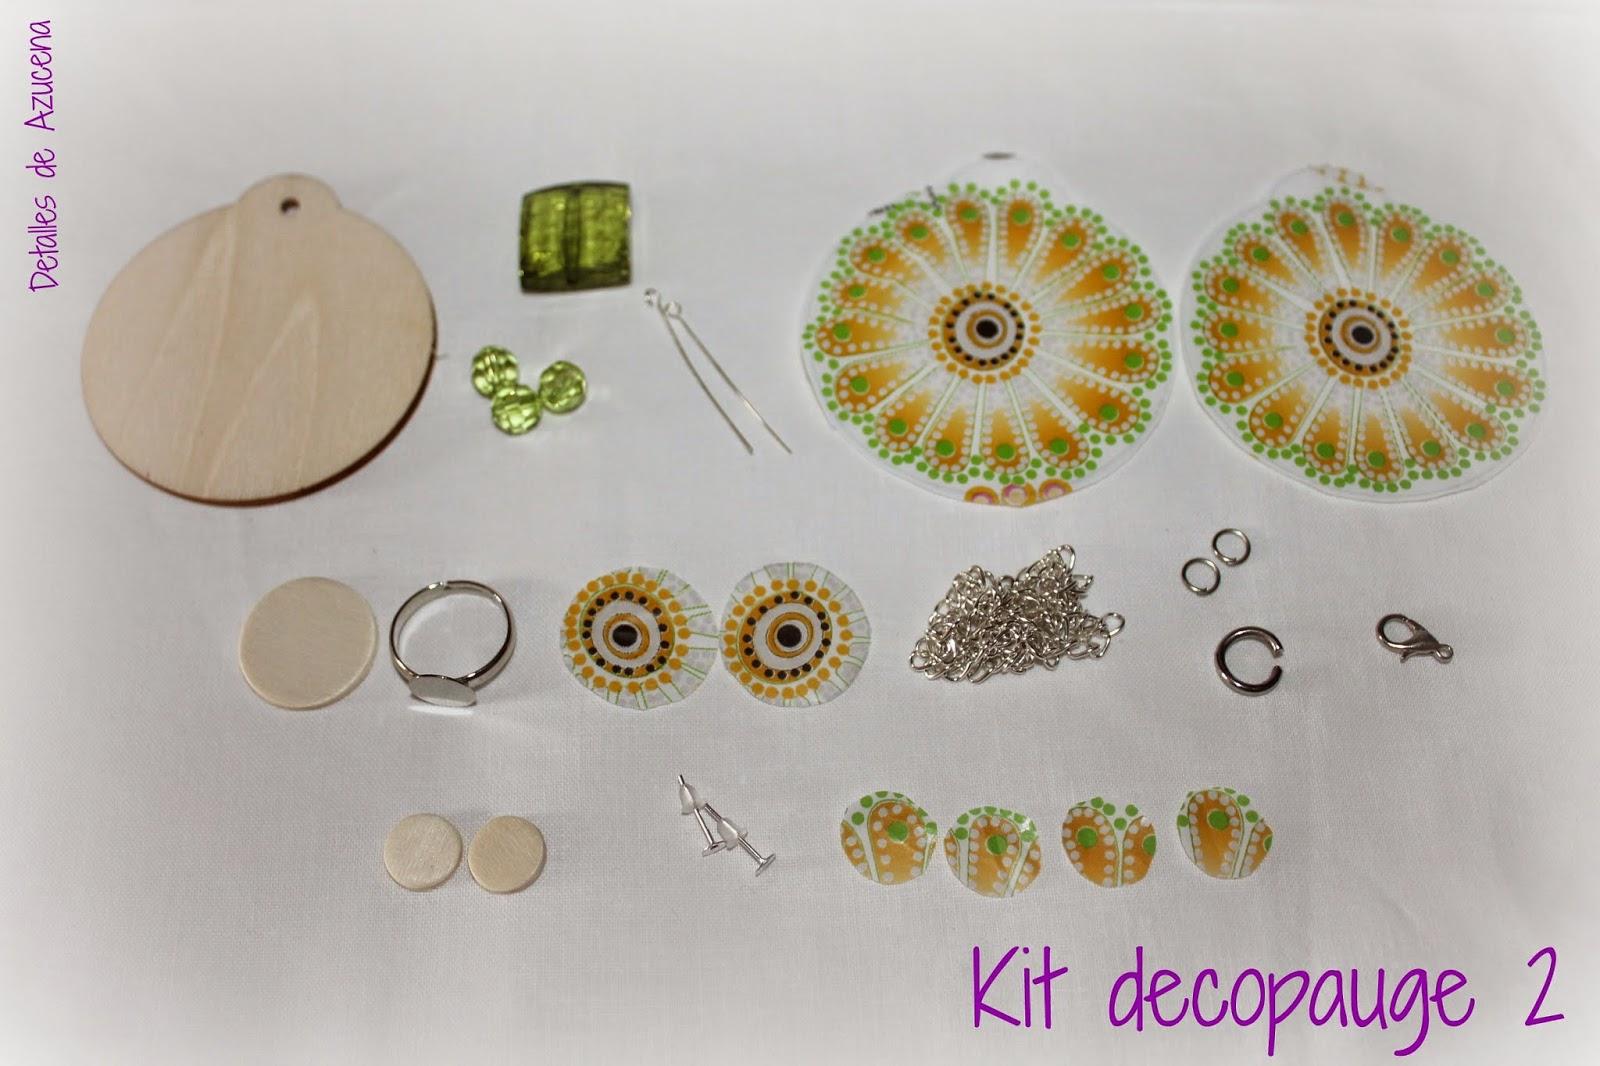 bisuteria creativa kits